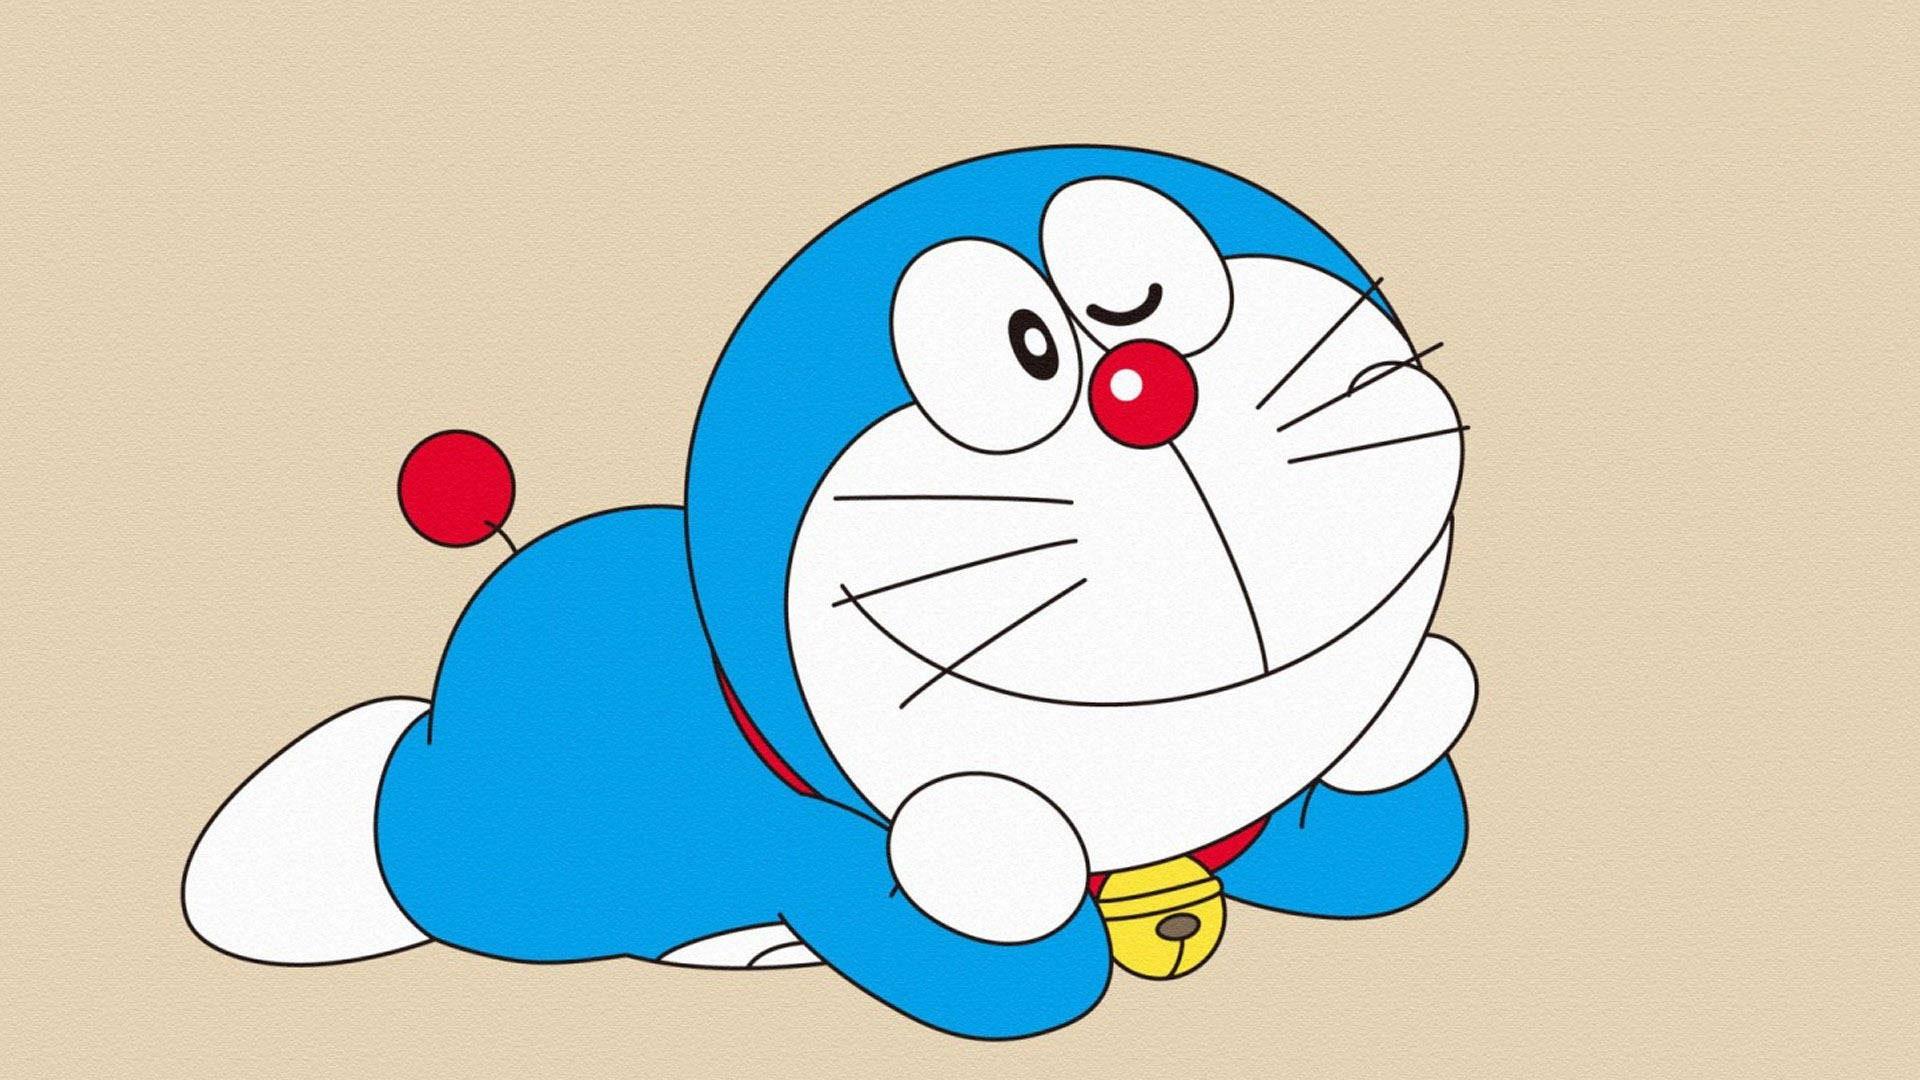 Doraemon Wallpapers - Top Free Doraemon Backgrounds ...